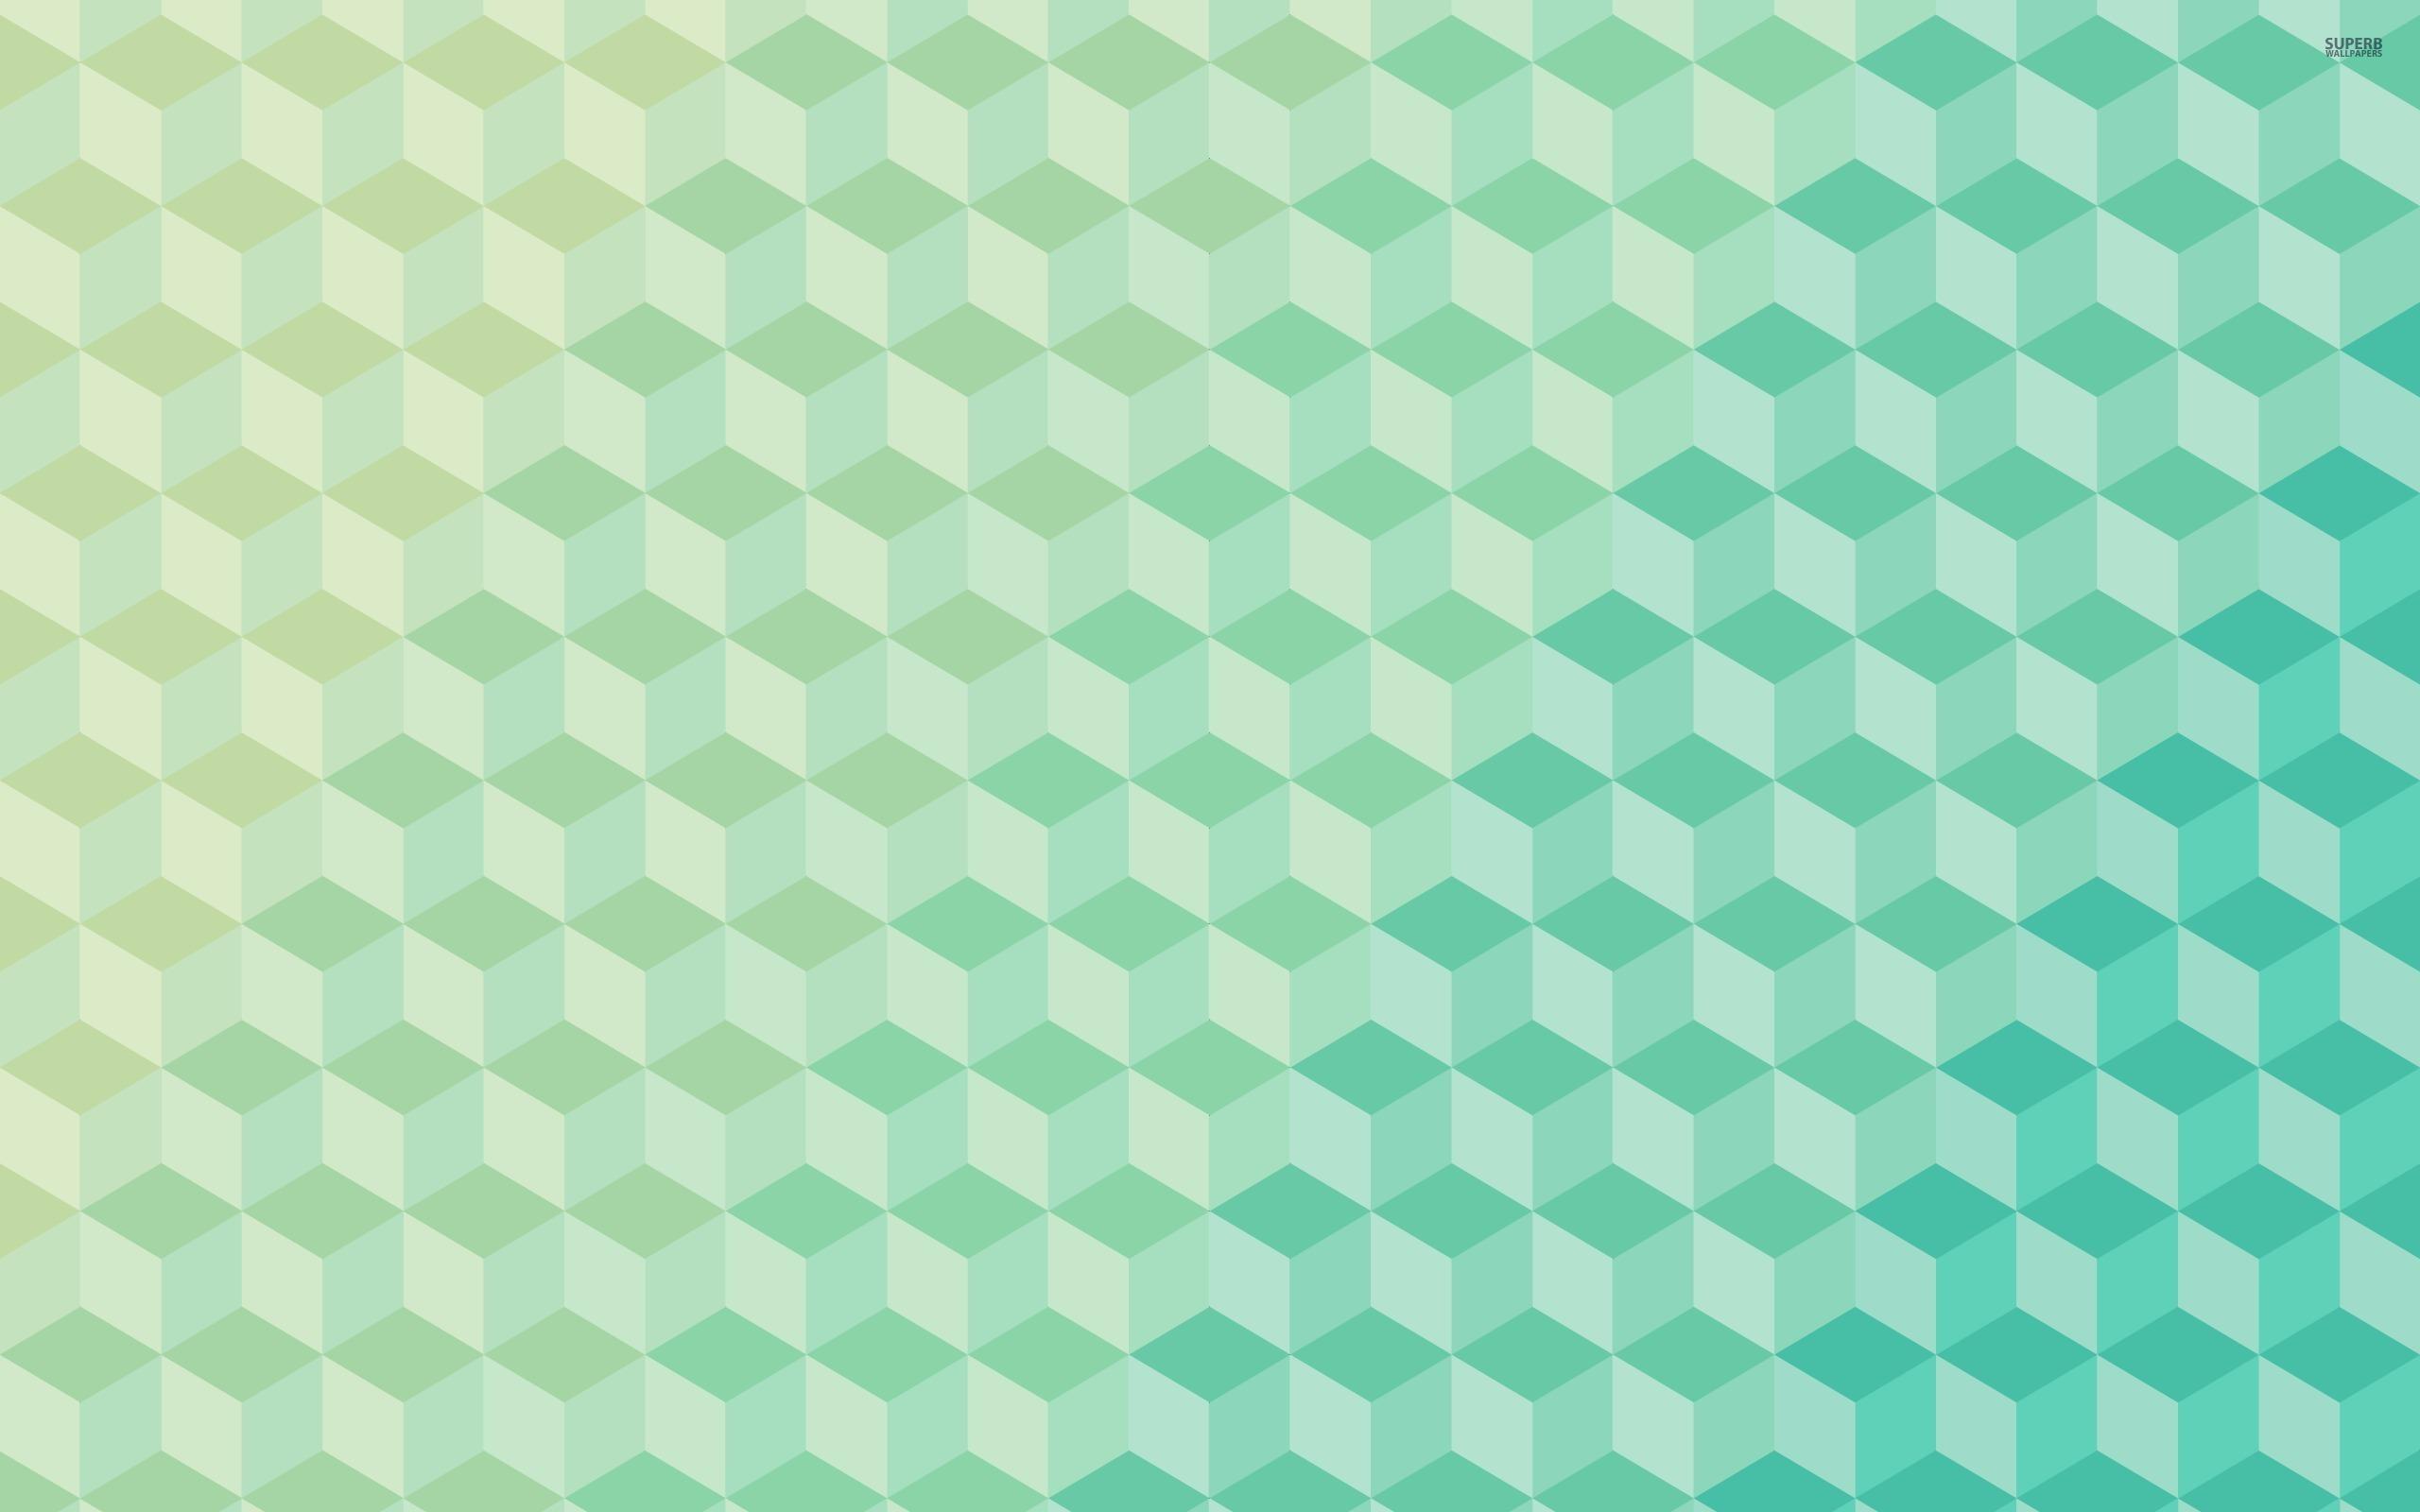 Best 40 Patterns Background on HipWallpaper Girly Patterns 2560x1600